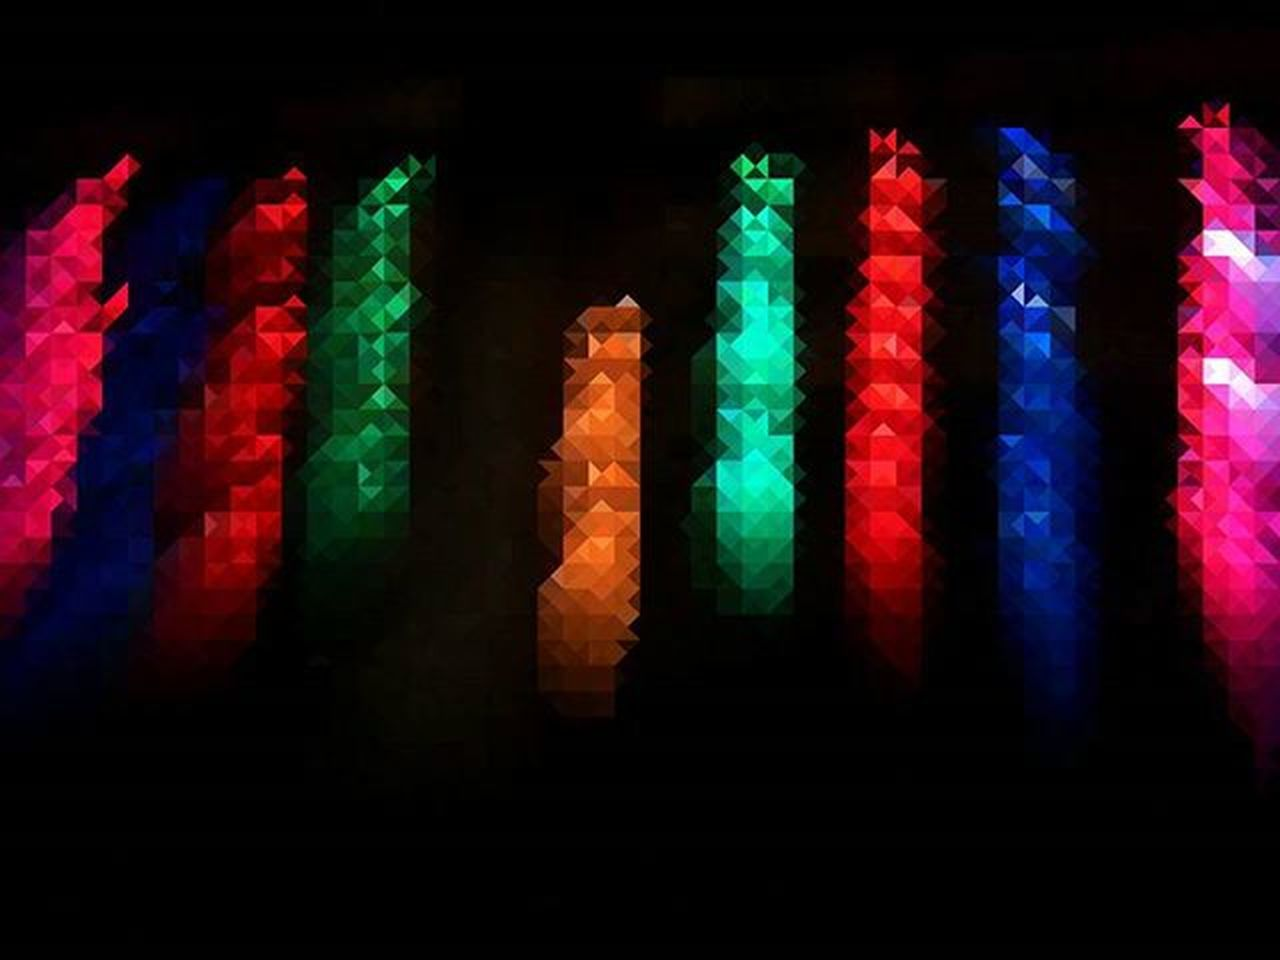 Diwali lights. Happy Diwali! Diwali Lights Decoration Polyeffect Pixlr Autodesk Edit Asus Zenfone Seewhatotherscantsee Asusglobal Igers Instadaily Instagood Instagram India_gram Indianstories Ig_Mumbai Ig_maharashtra Ig_india Ig_worldclub _soi Repostingindia Indian_photographers